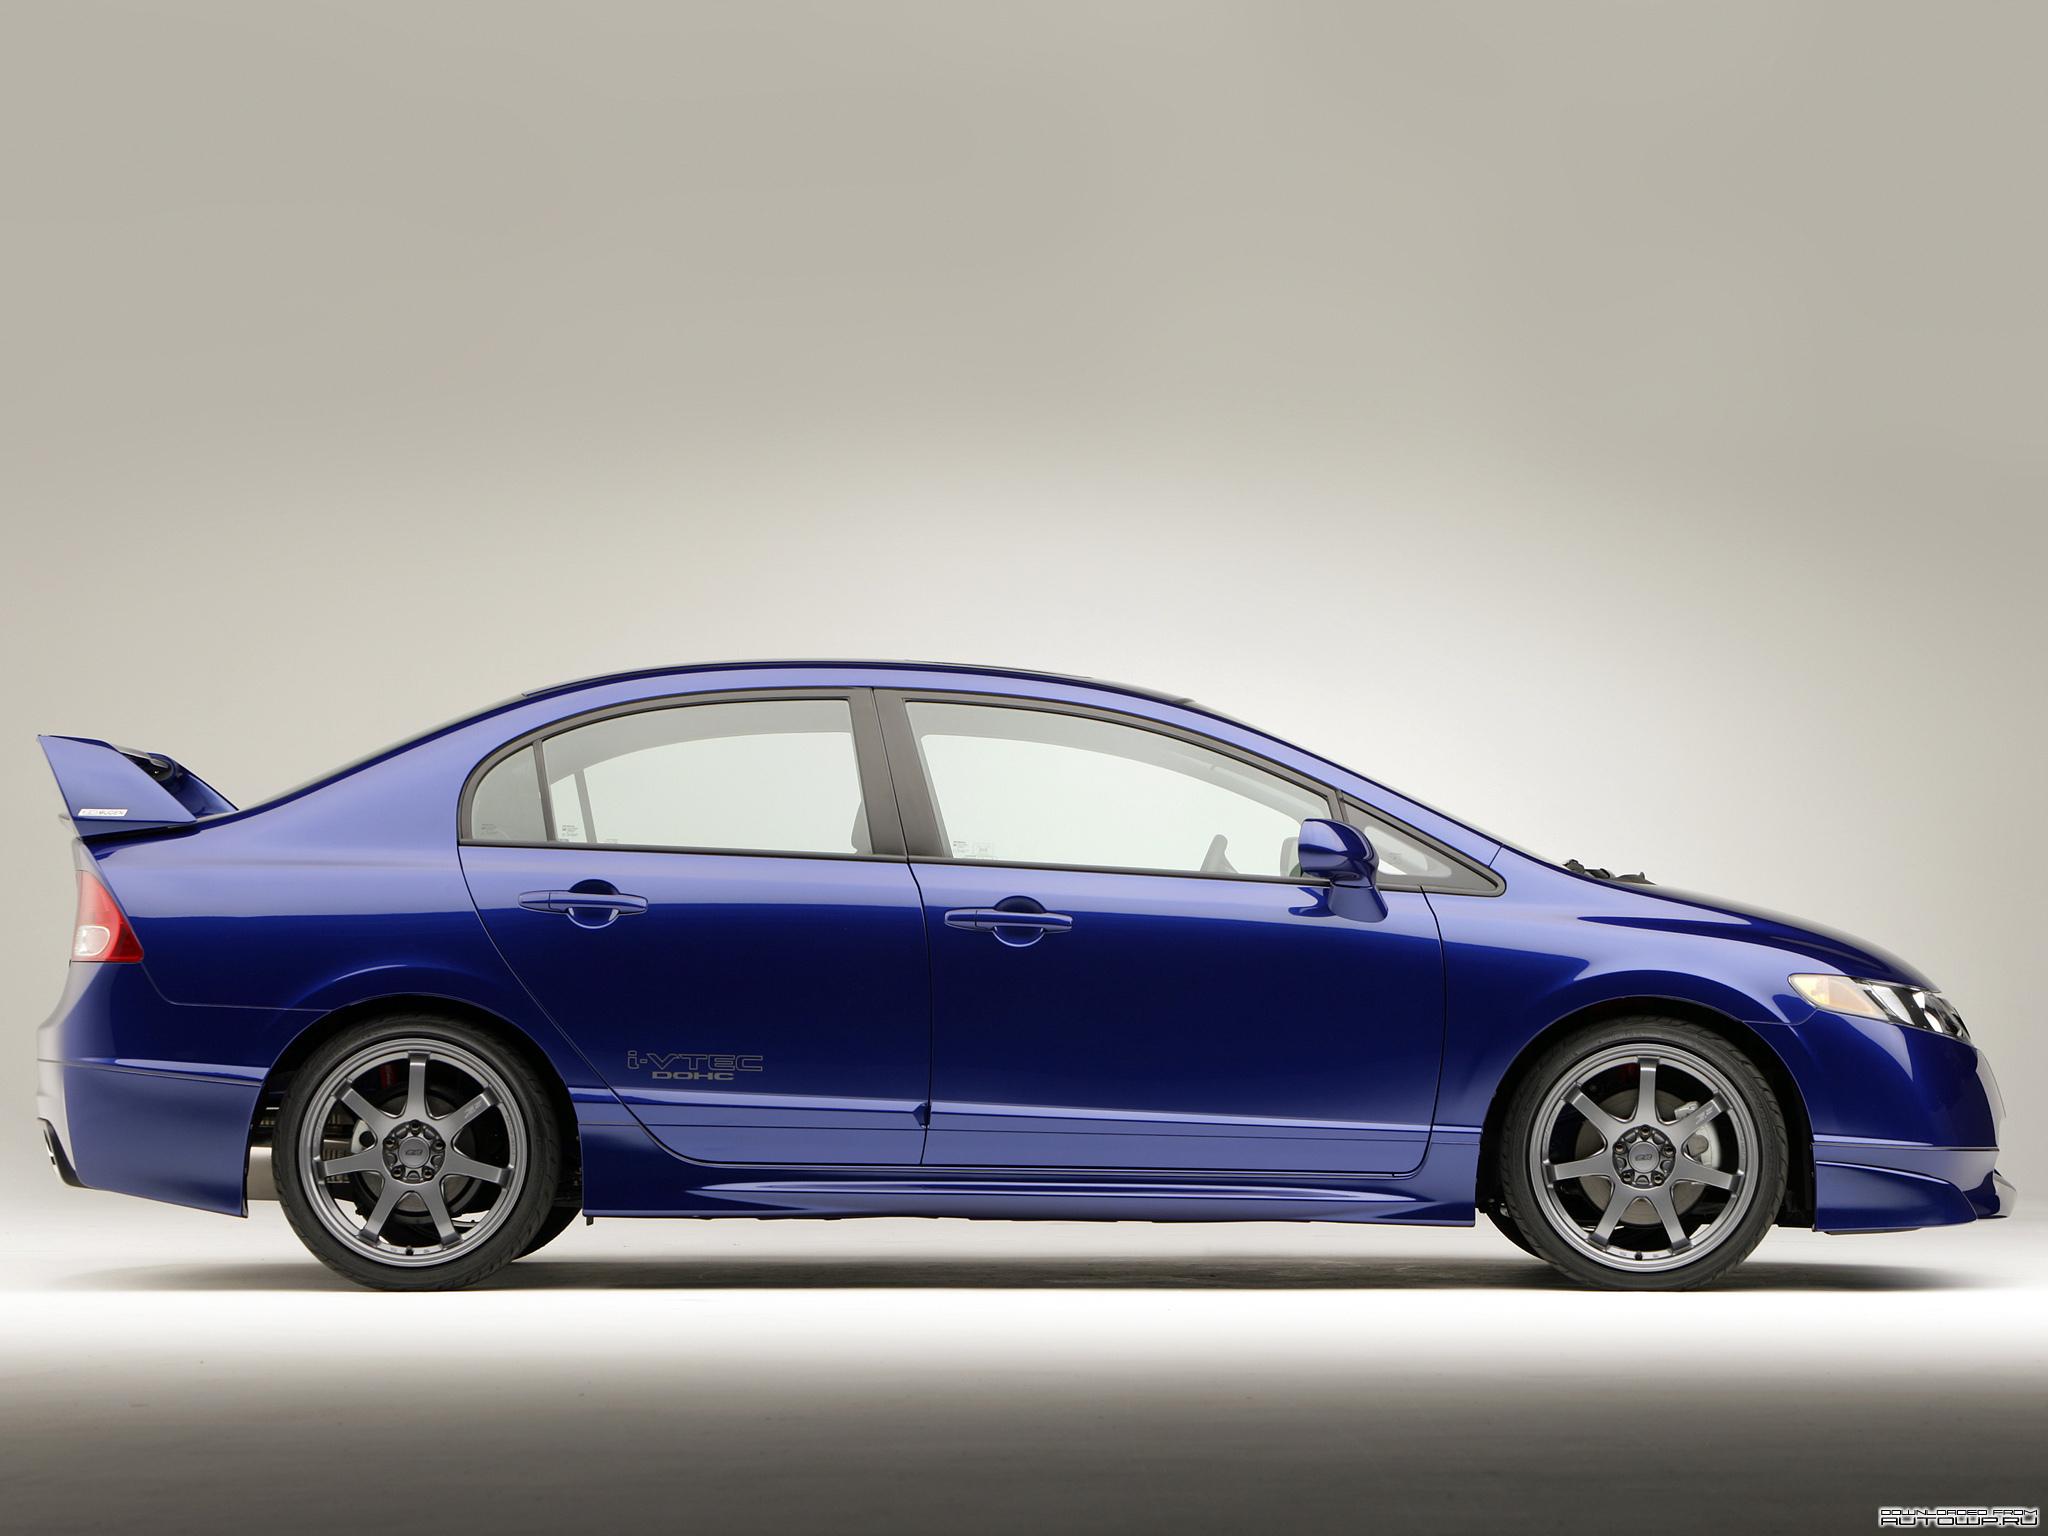 Mugen Honda Civic Si Sedan photos Gallery with 22 pics